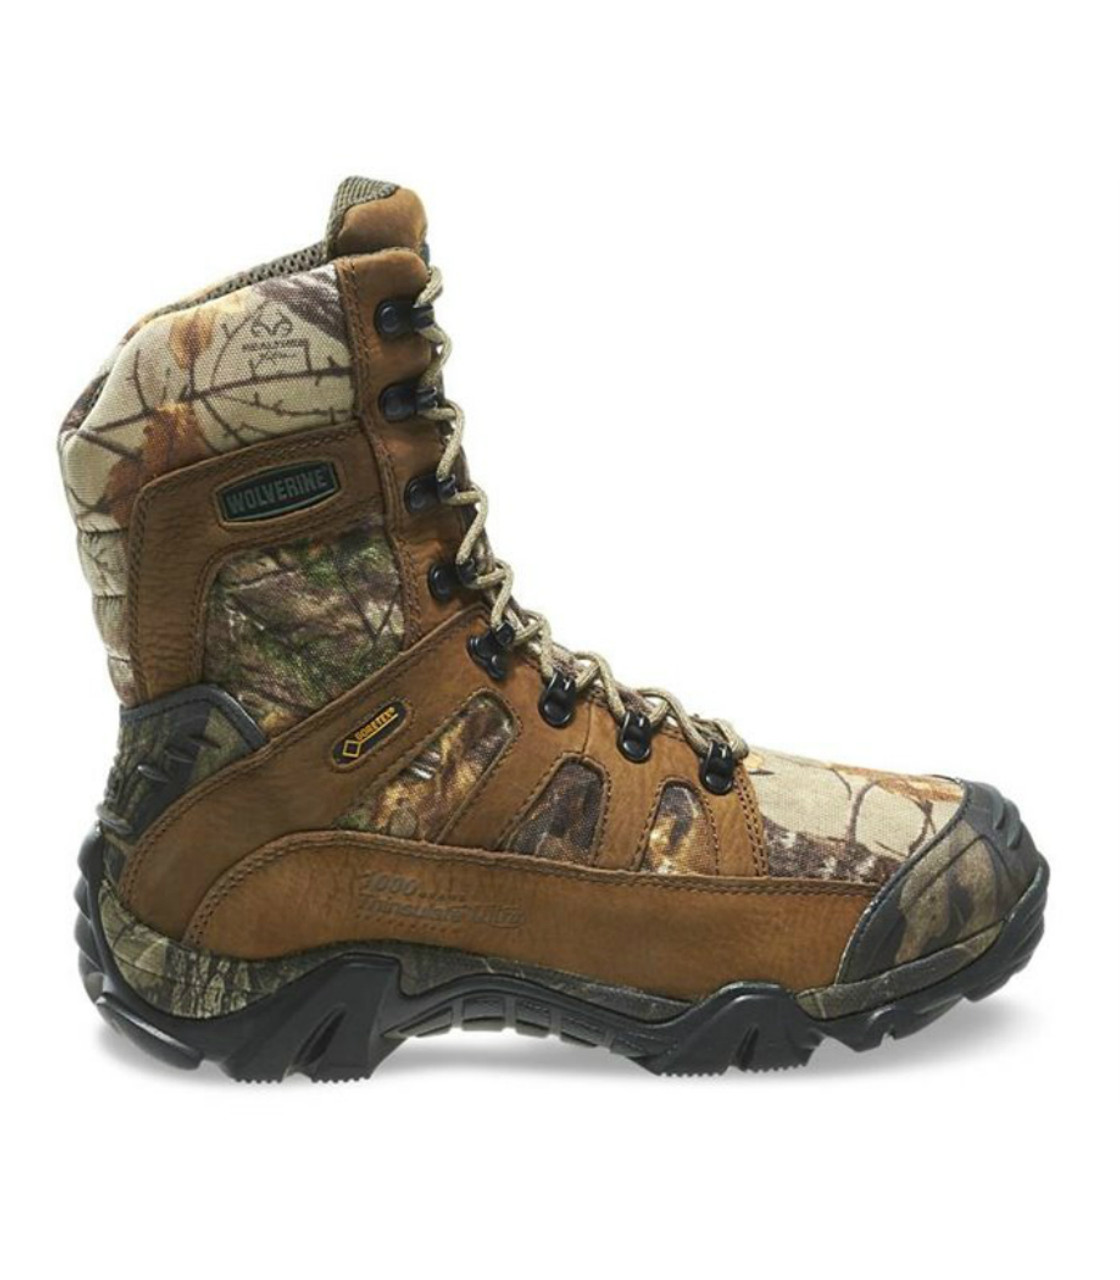 962b3a1b584 Wolverine W30082 Mens 8 Inch Ridgeline Xtreme Hunting Boot